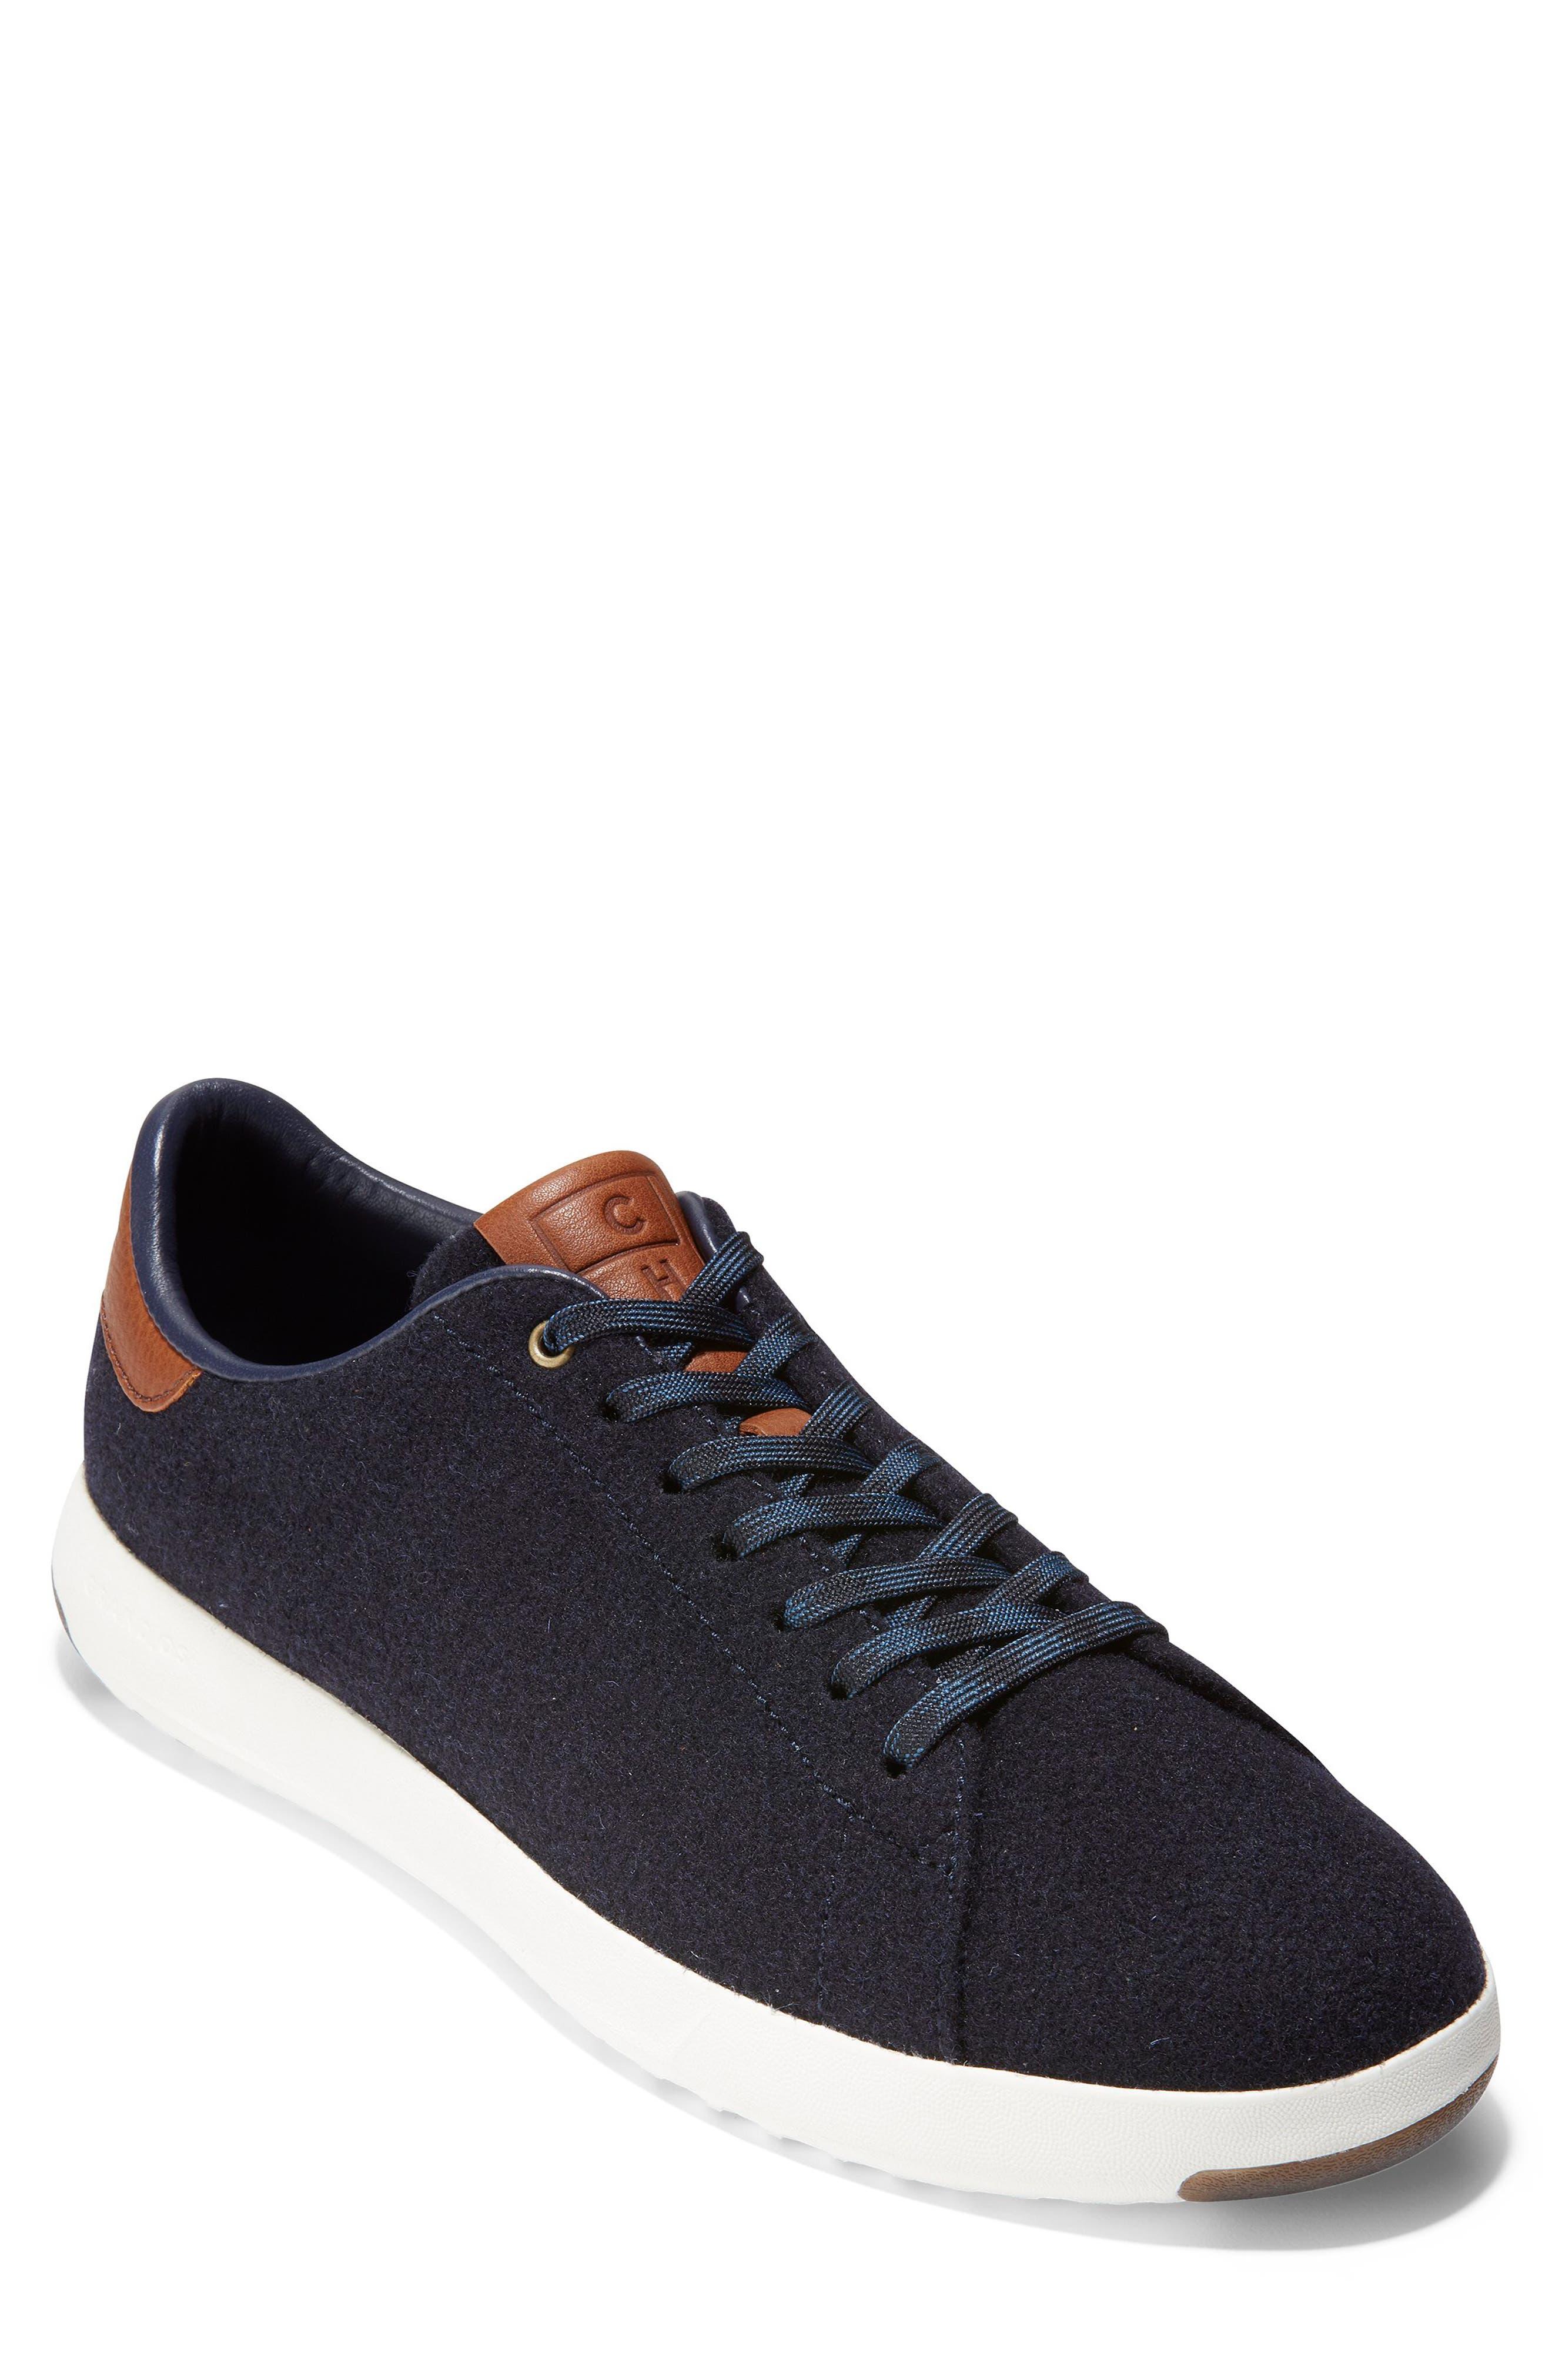 GrandPro Tennis Sneaker,                         Main,                         color, NAVY INK WOOL/ BRITISH TAN